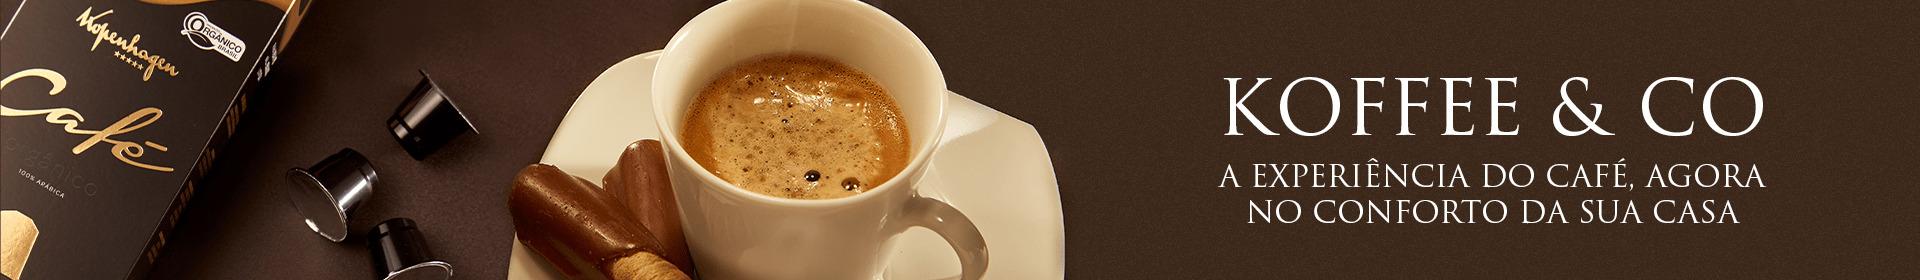 Koffee & Co